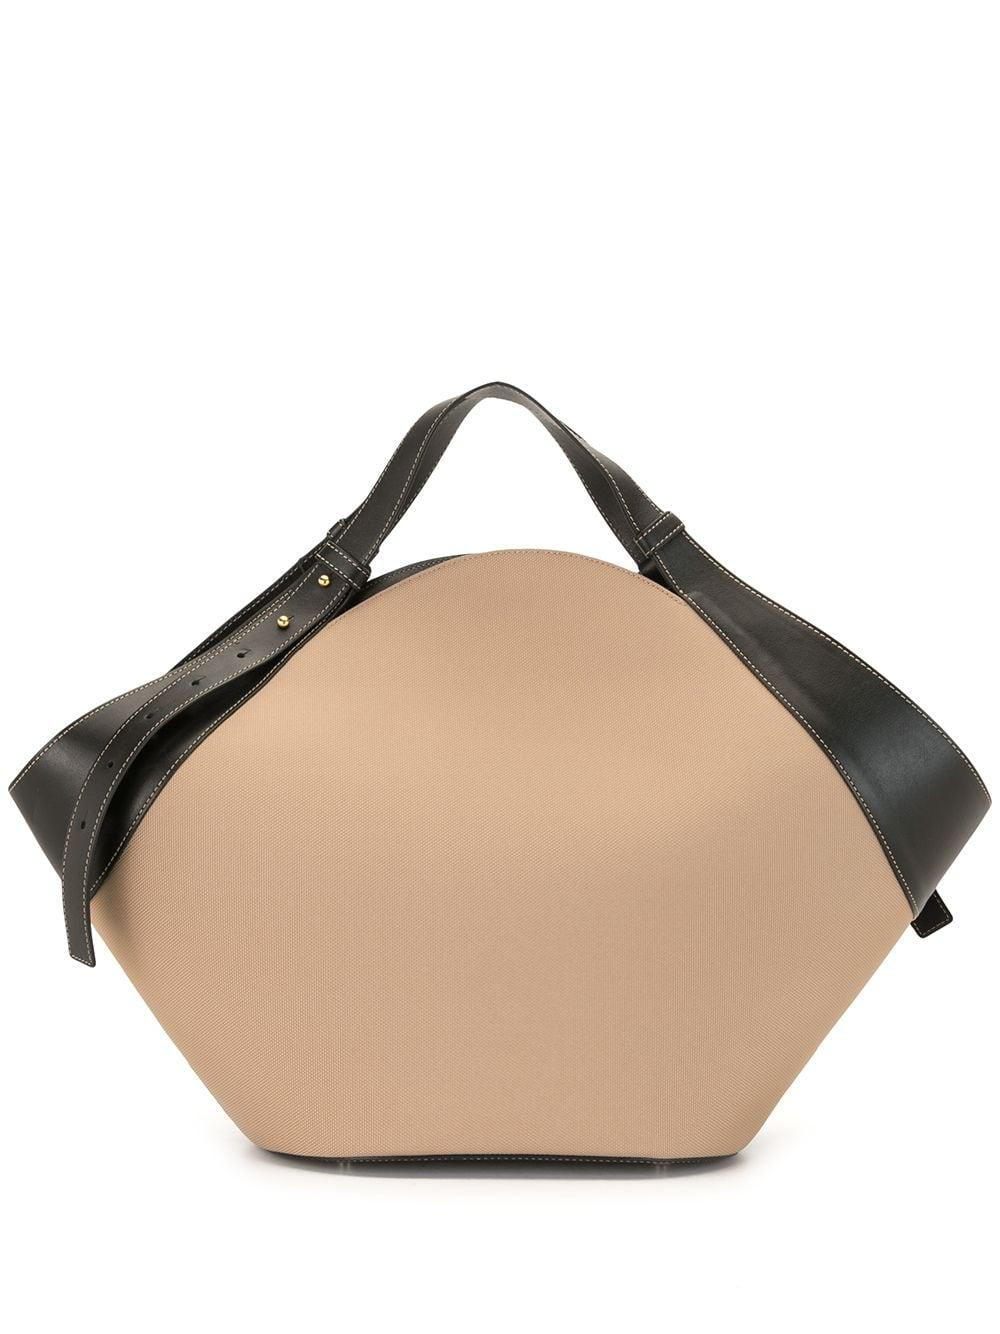 Basket Tote Bag Item # YUZPF20-BA-04